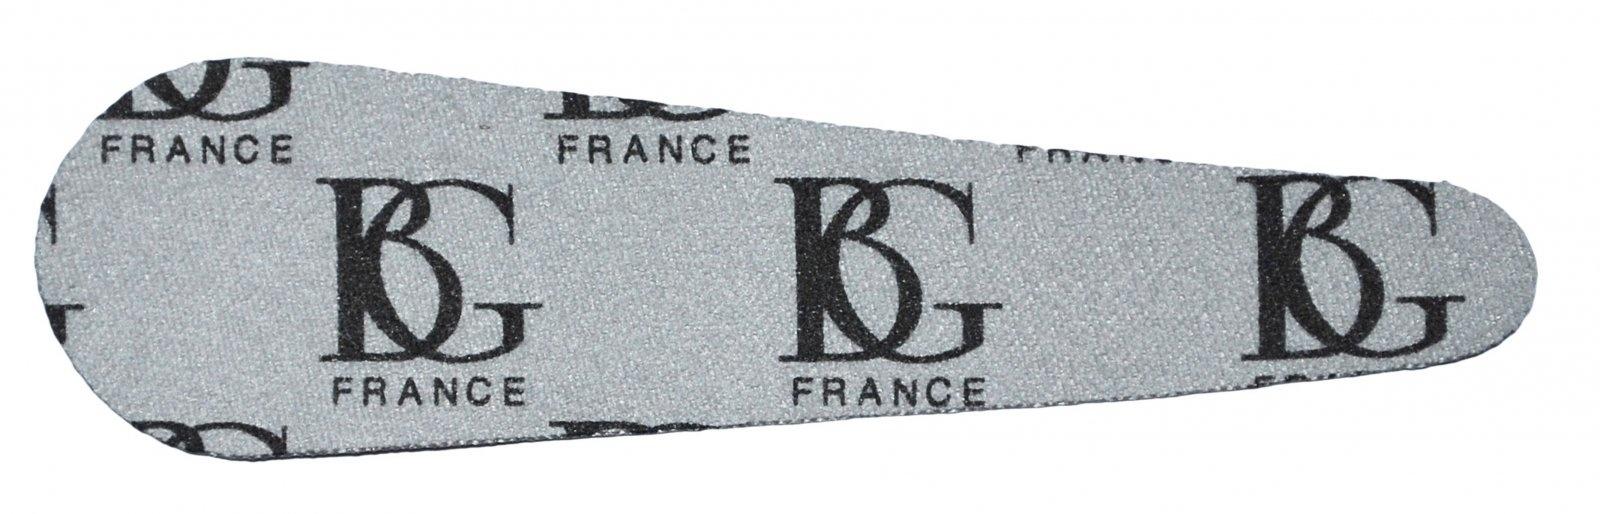 BG France BG Pad Dryer - Microfiber